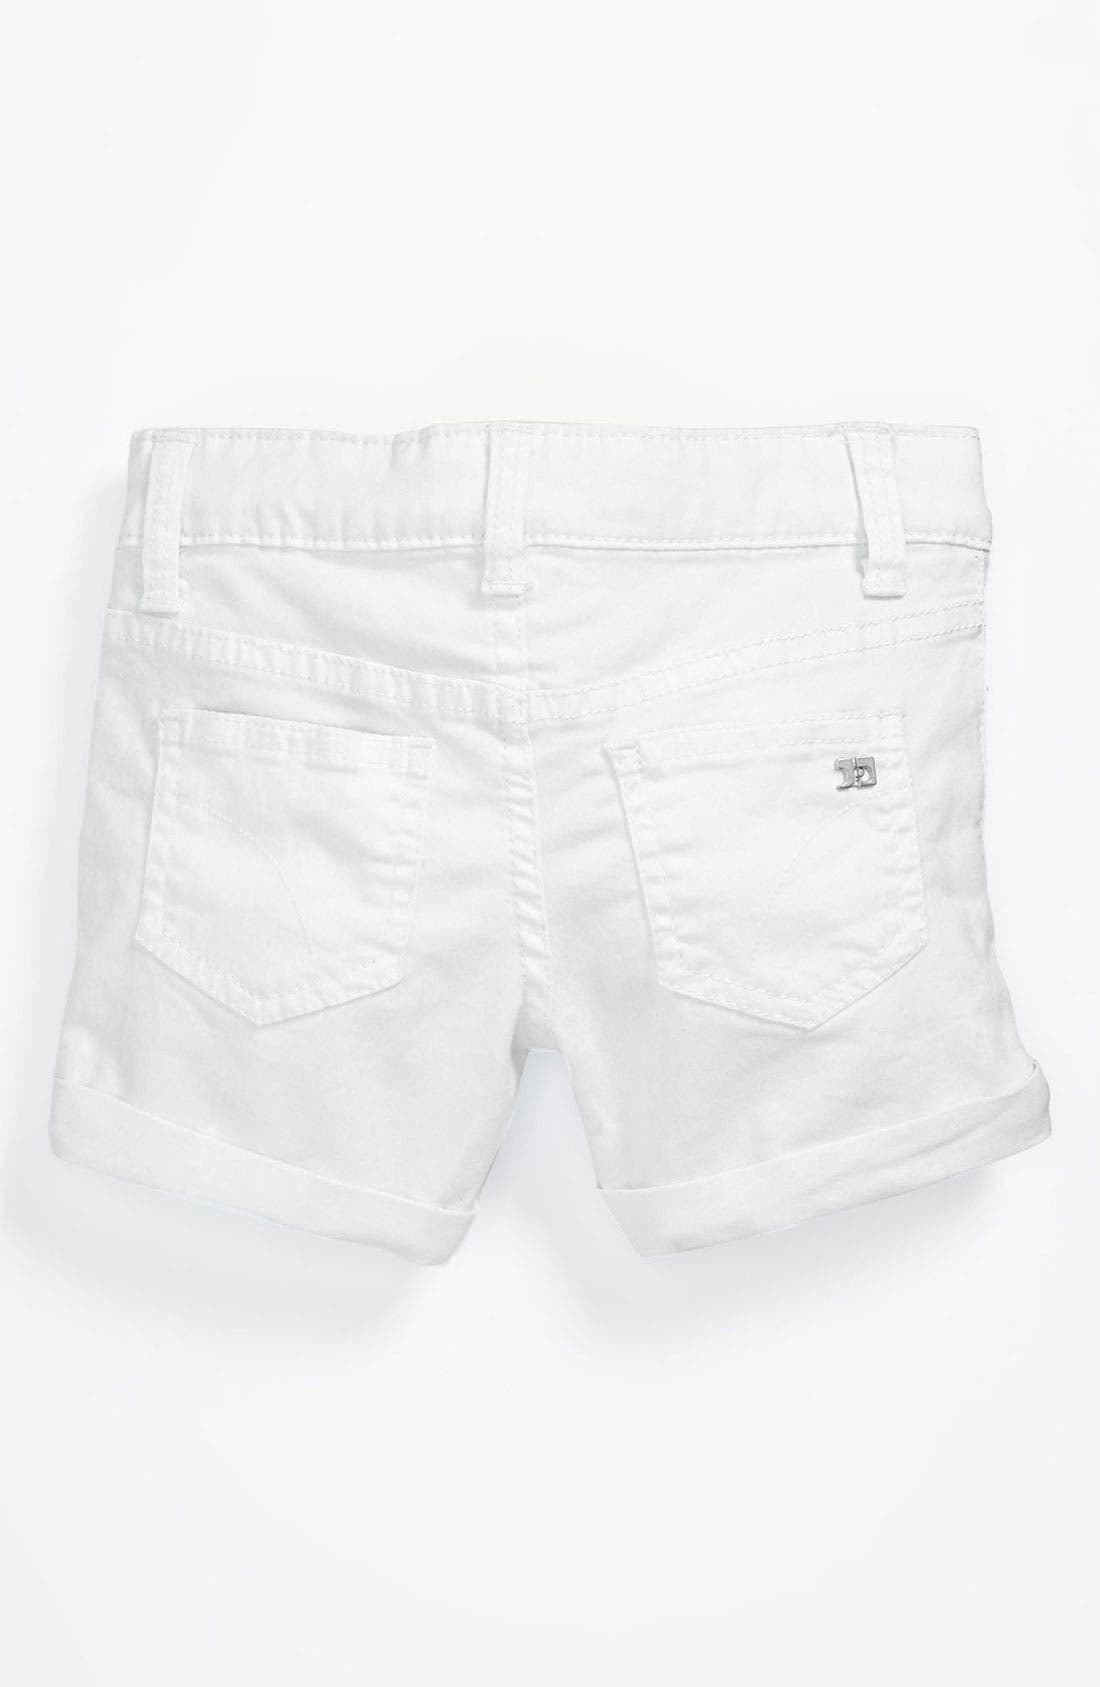 Alternate Image 1 Selected - Joe's 'New Rolled Mini' Denim Shorts (Toddler Girls)